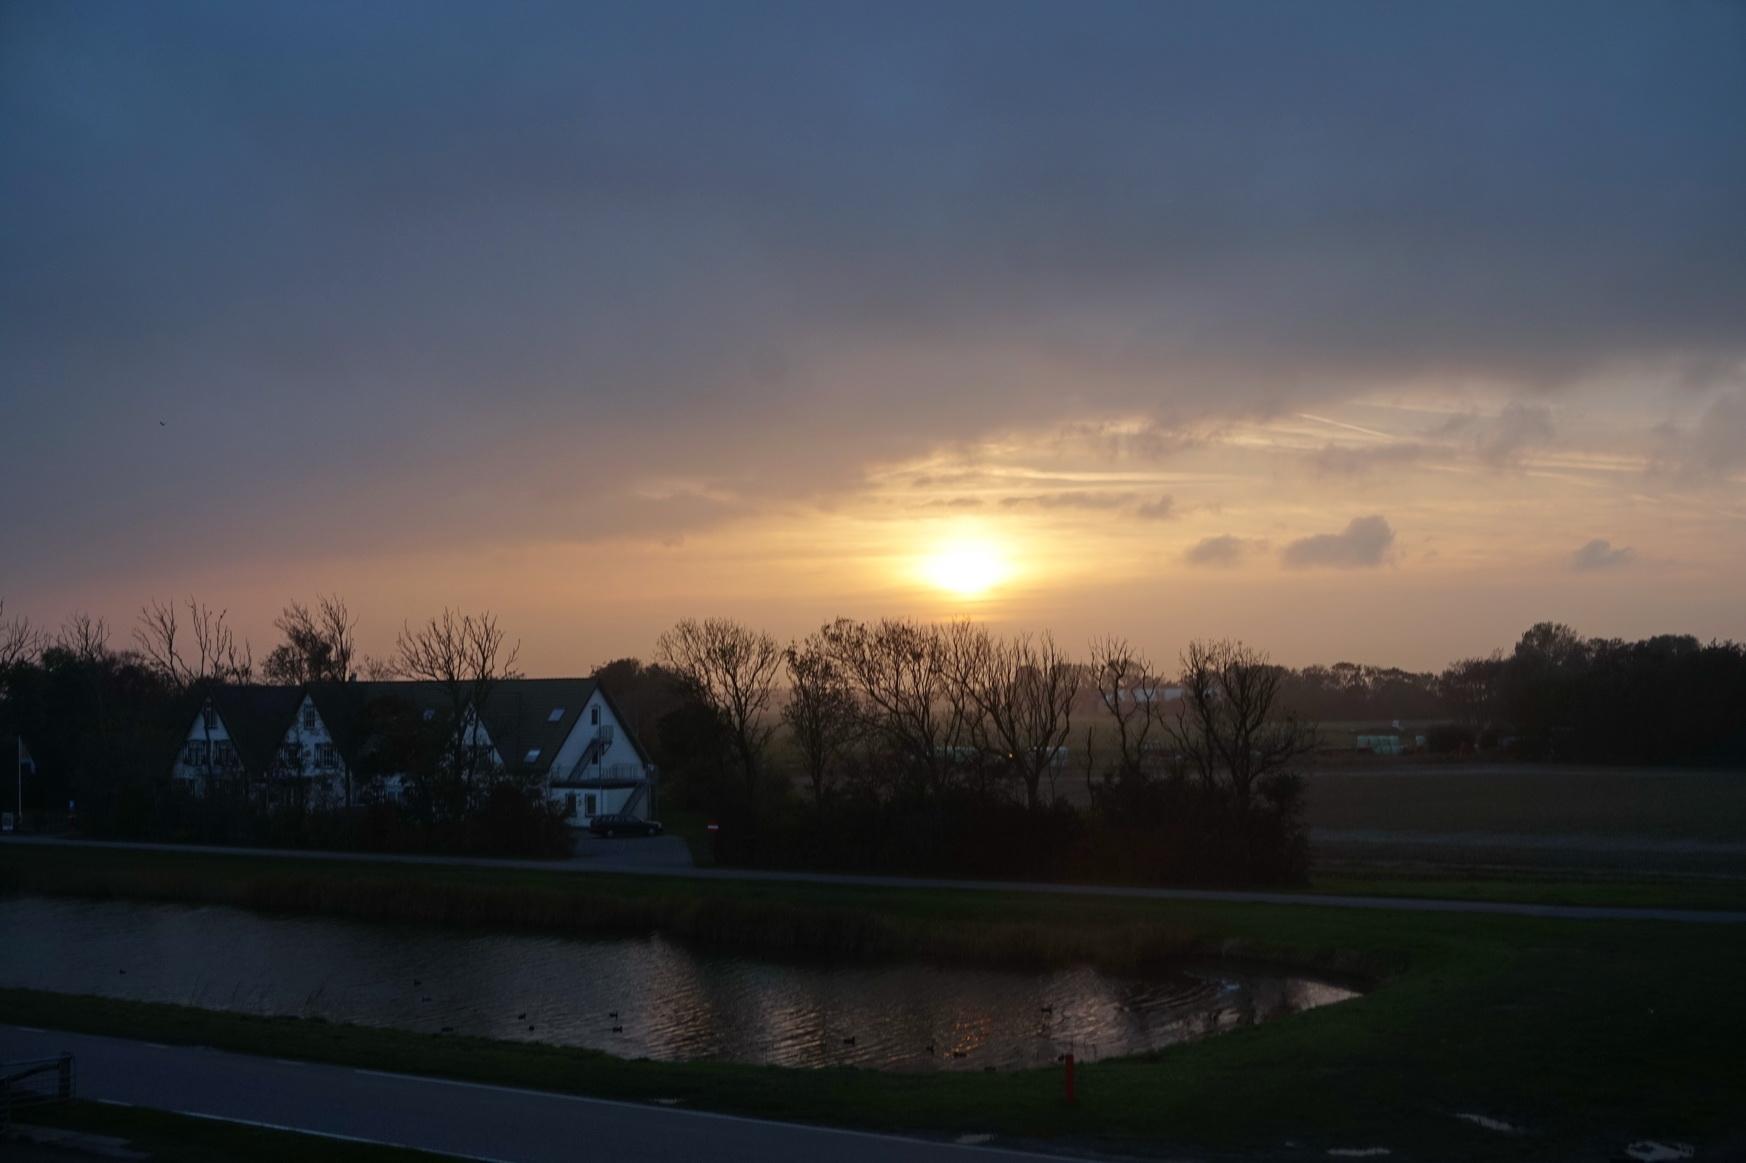 Das Hotel Prins Hendrik im Sonnenuntergang